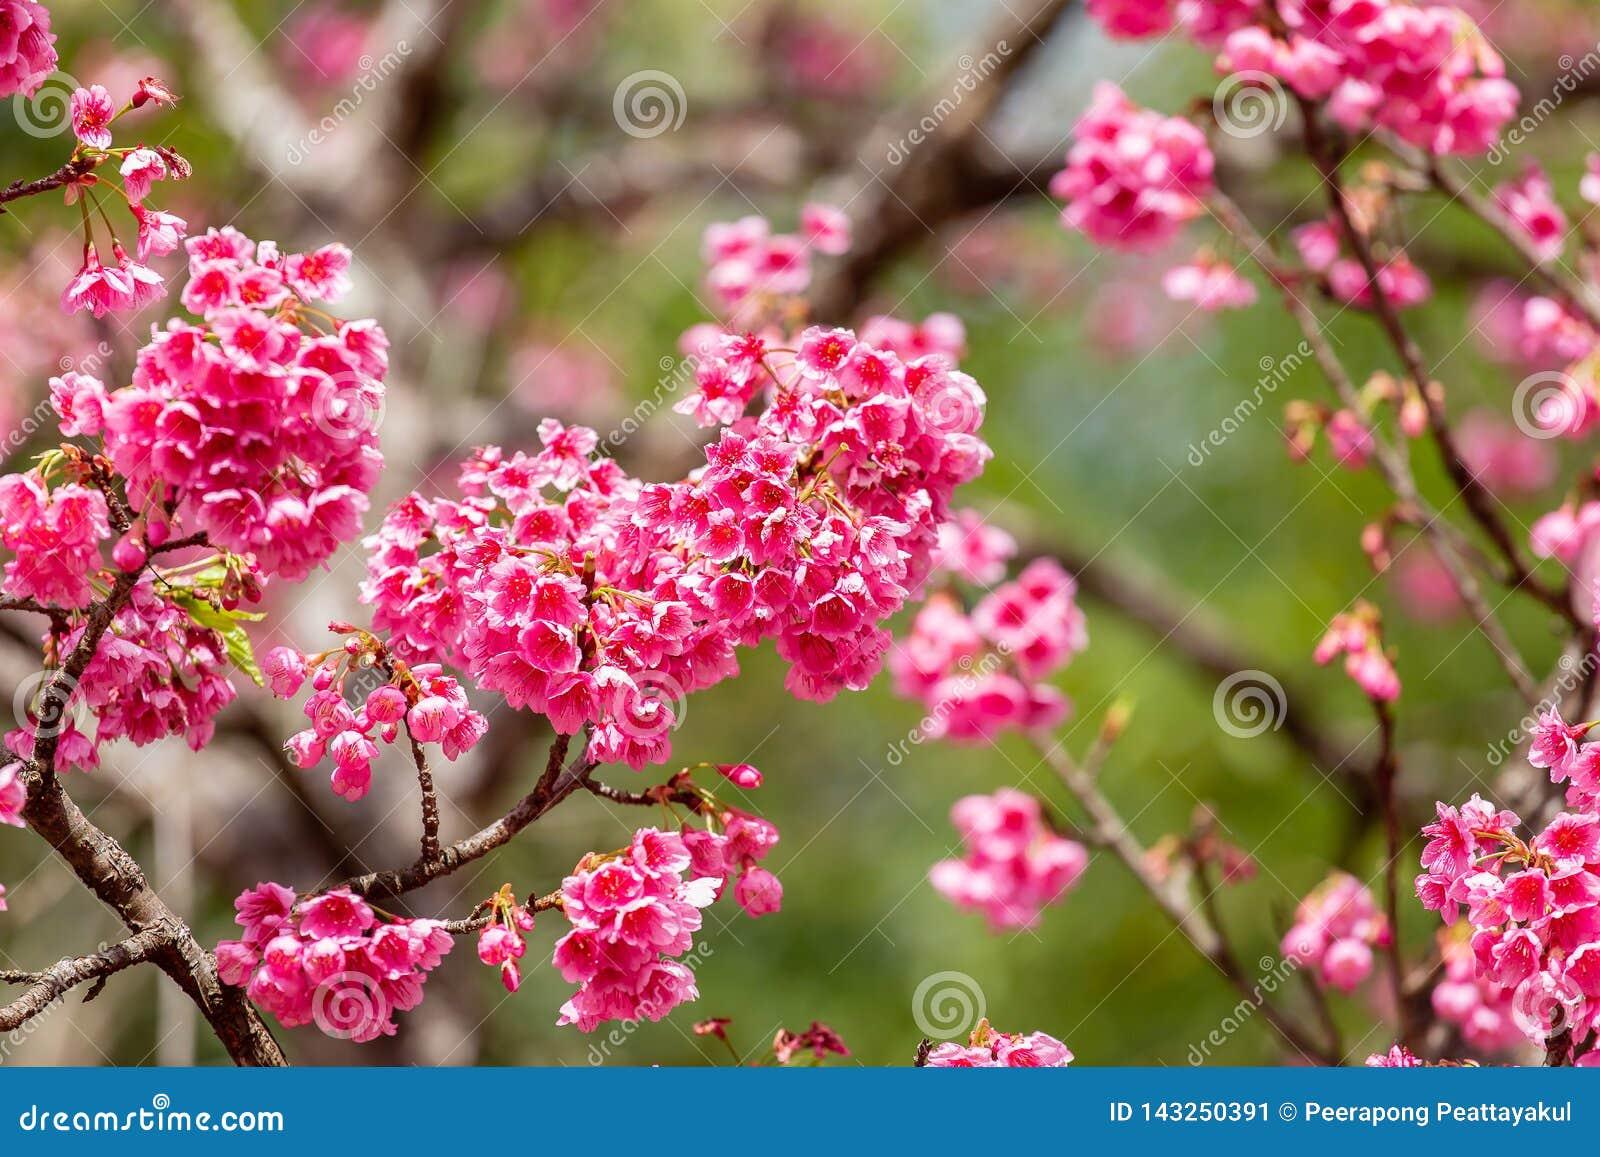 Cherry Blossom And Sakura Wallpaper Stock Image Image Of